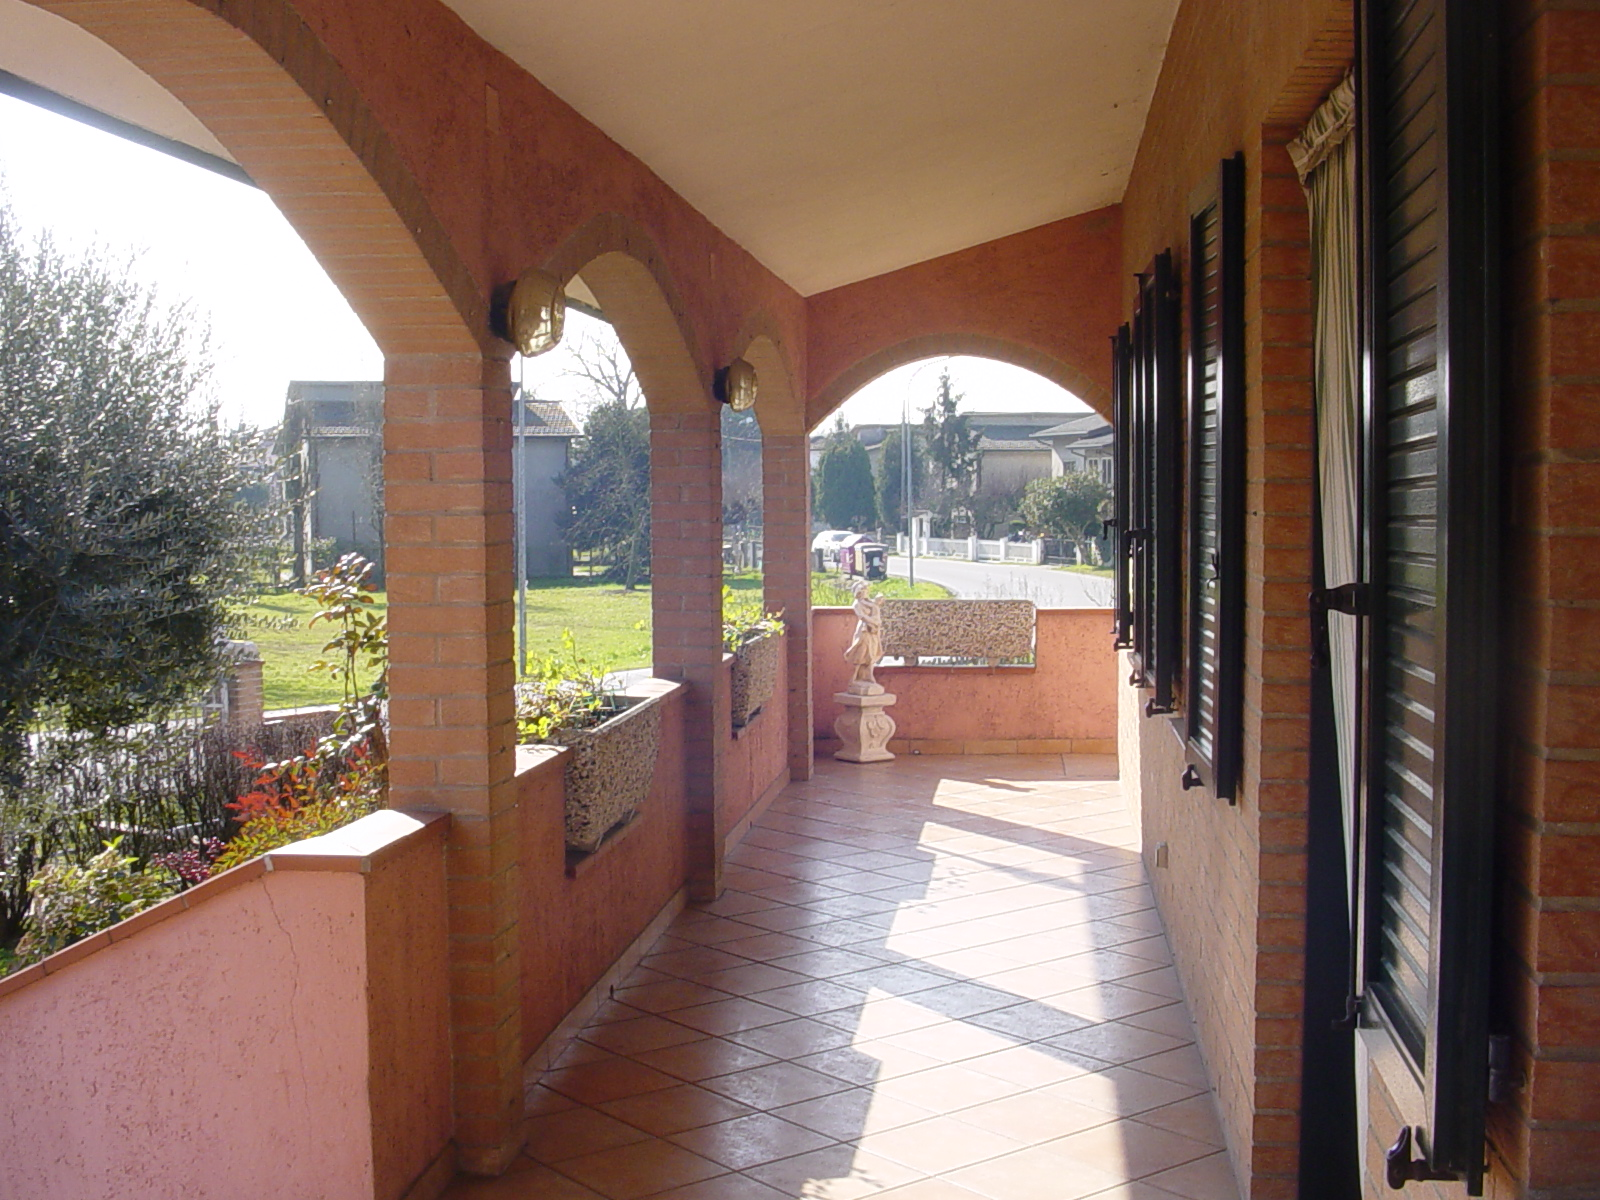 Vente Villa Ro Ferrara Italie Via Dazio 23 A Italie